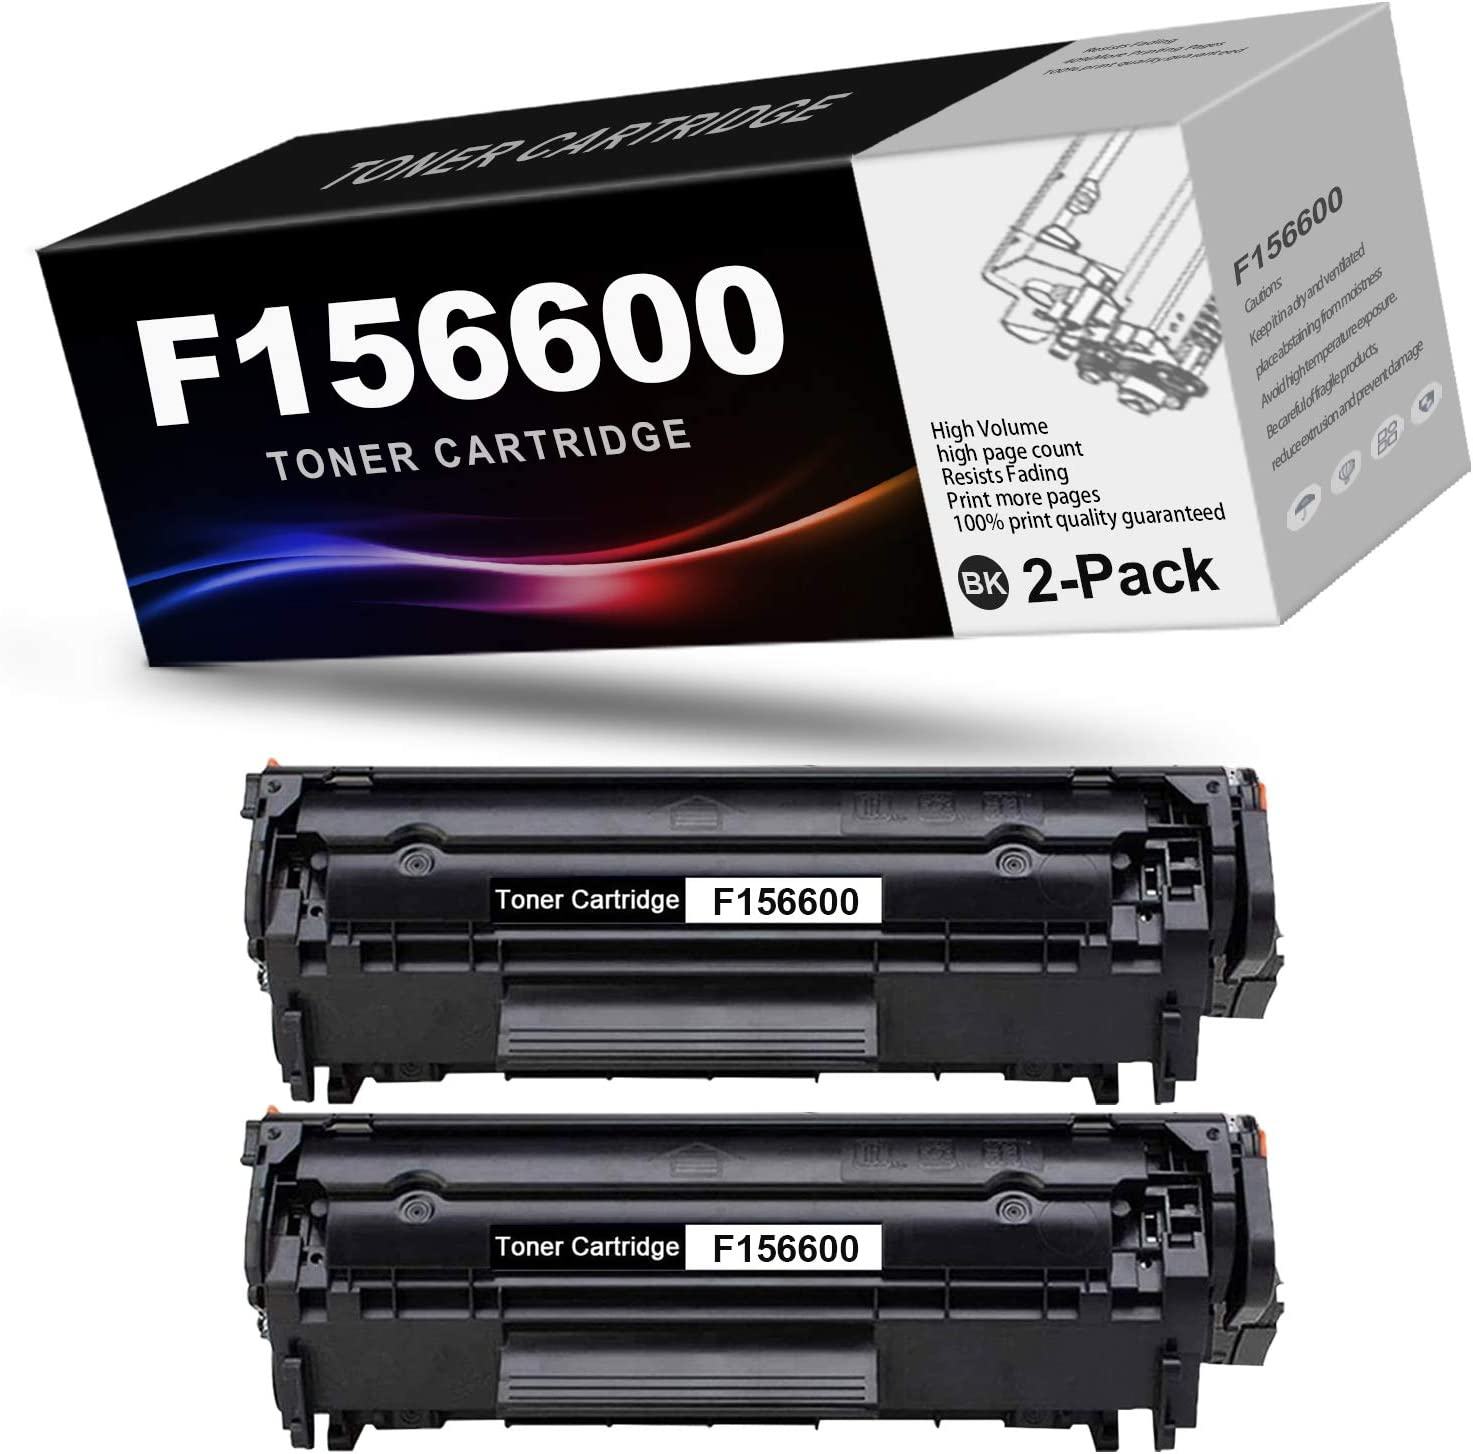 2-Pack Black Compatible F156600 Toner Cartridge Replacement for Canon F156600 Printer Toner Cartridge